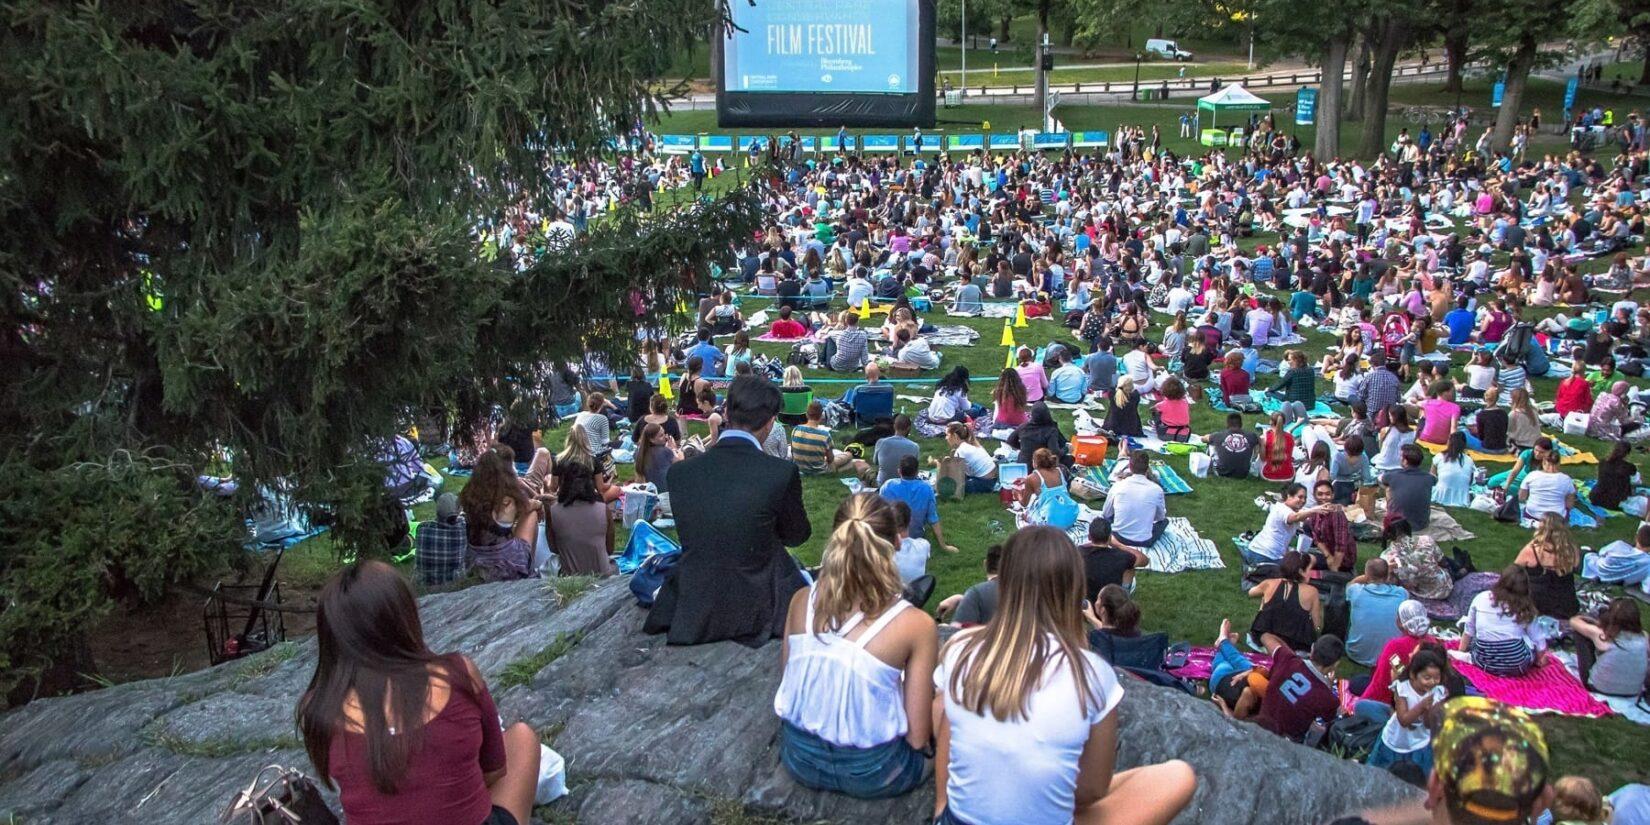 Central Park Conservancy Film Festival 1